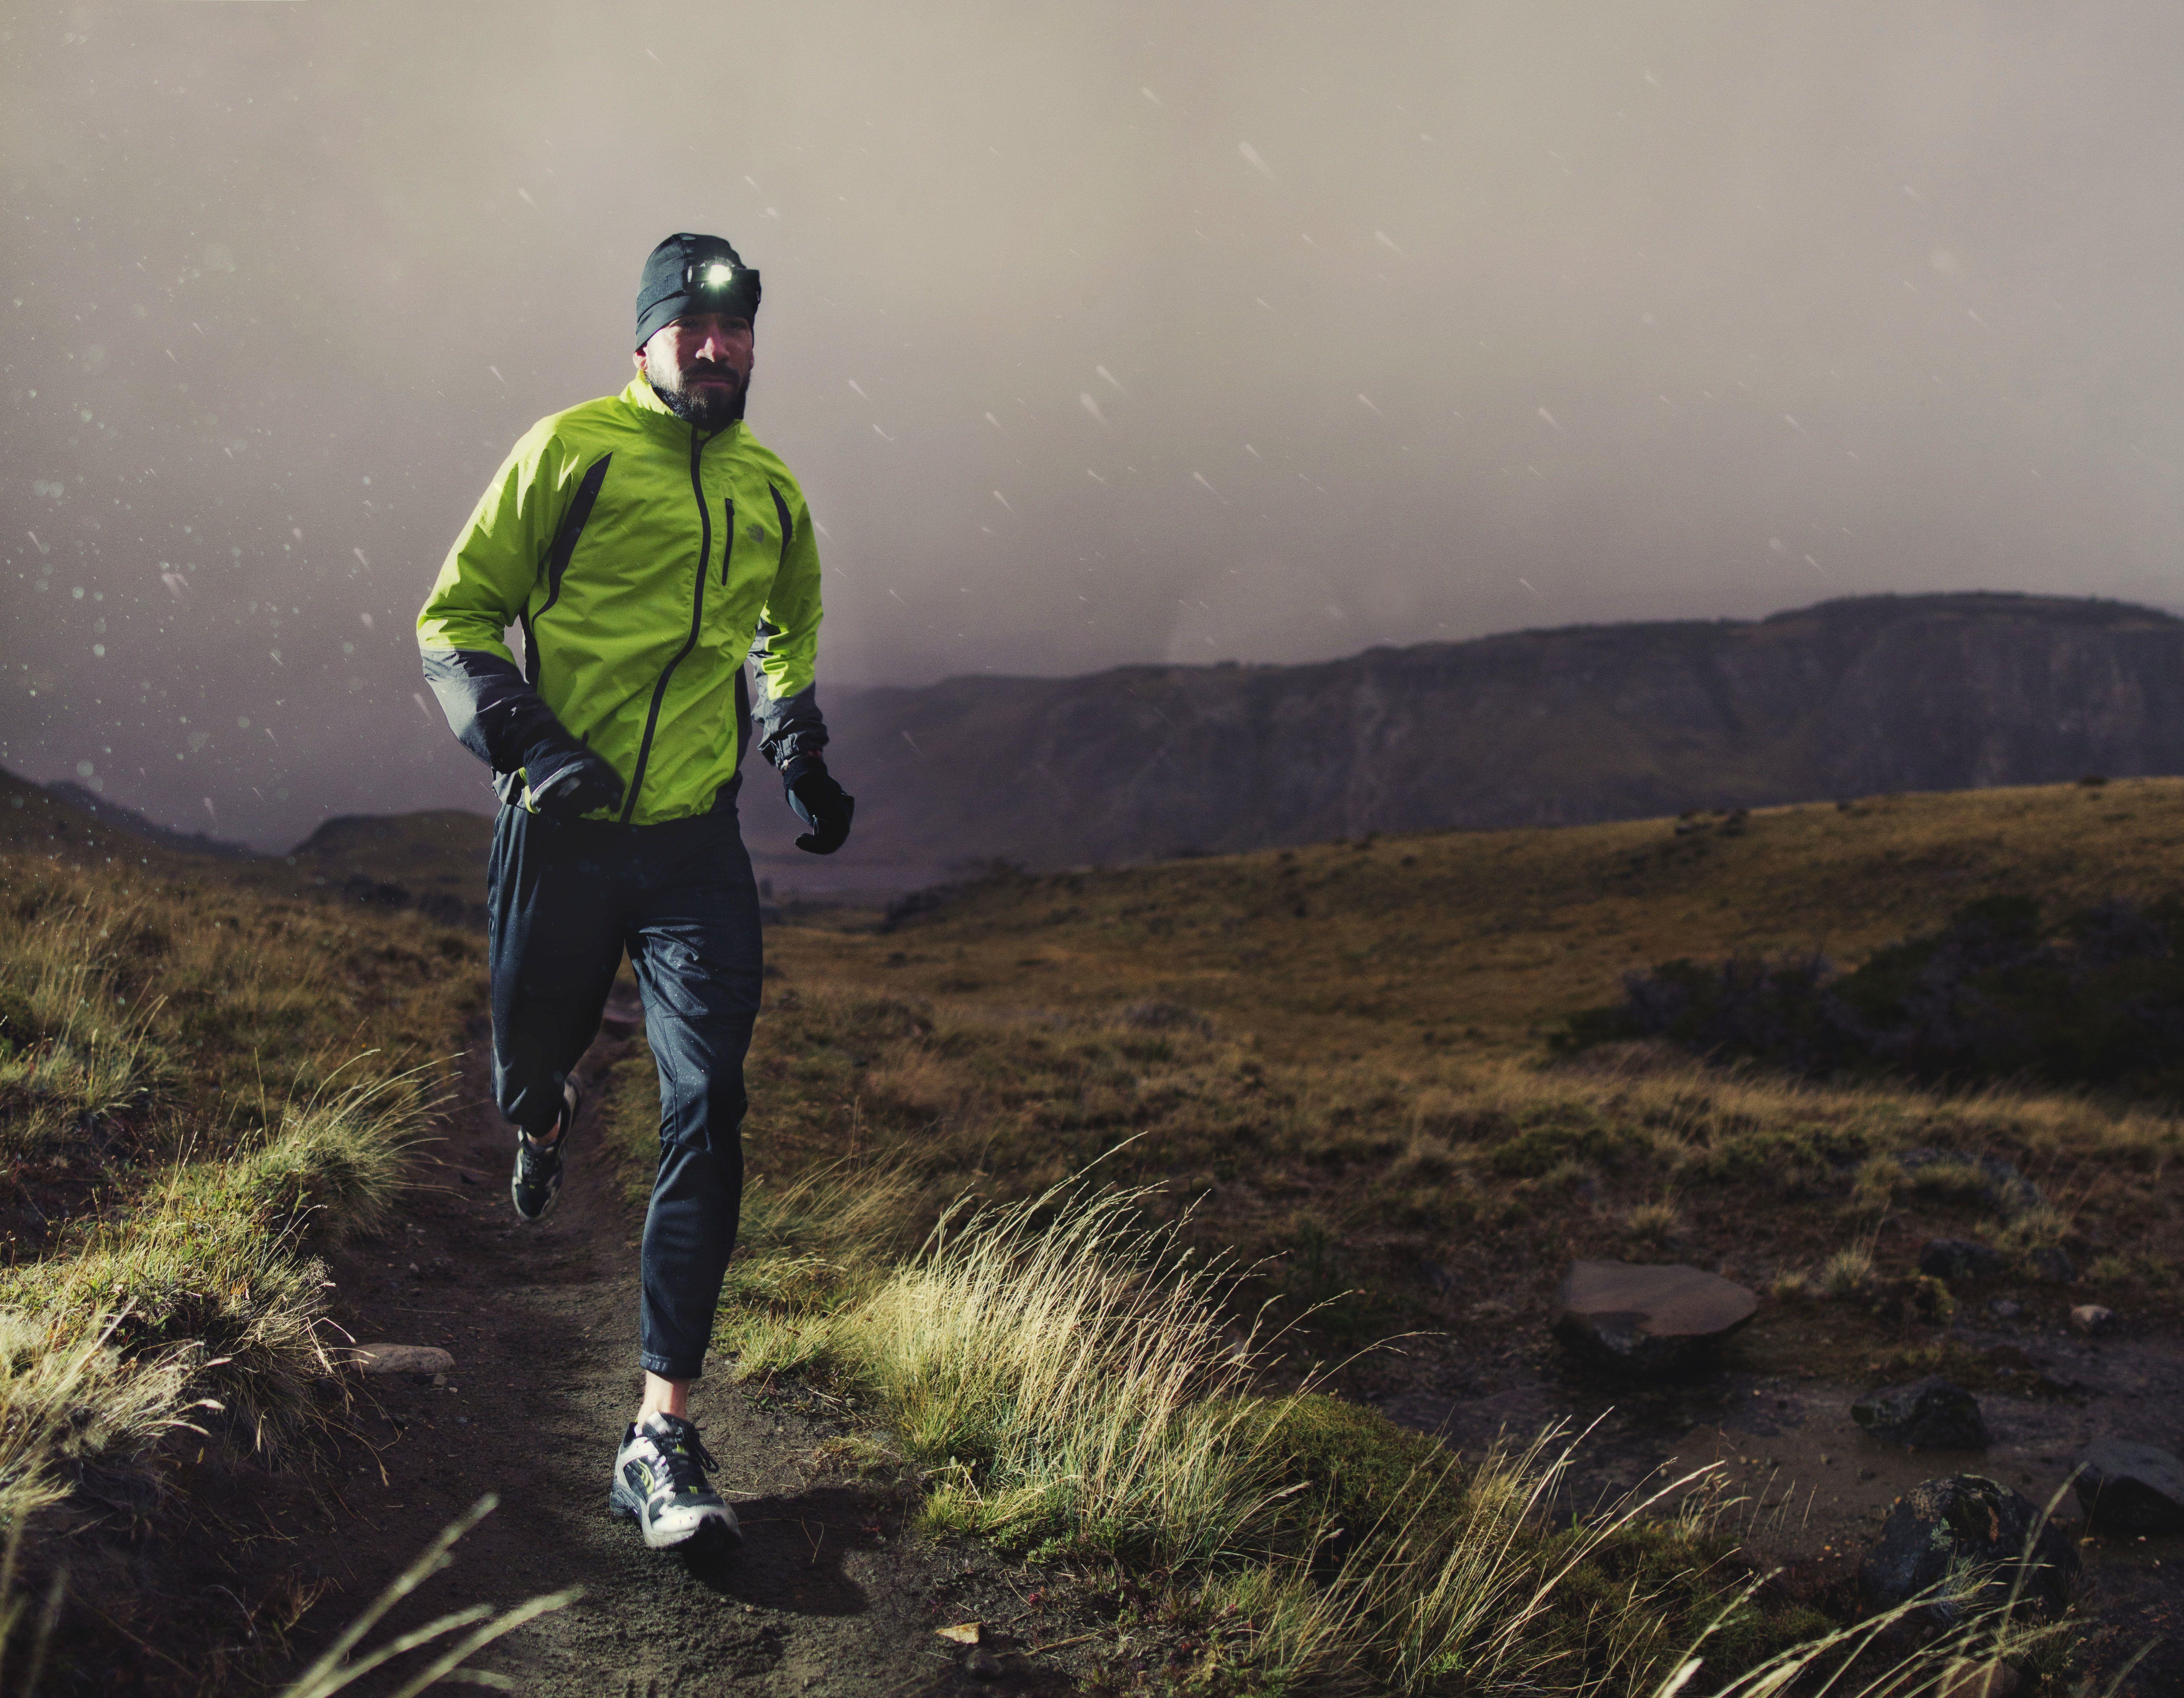 Photo of Hal Koerner courtesy of The North Face Sportkleding